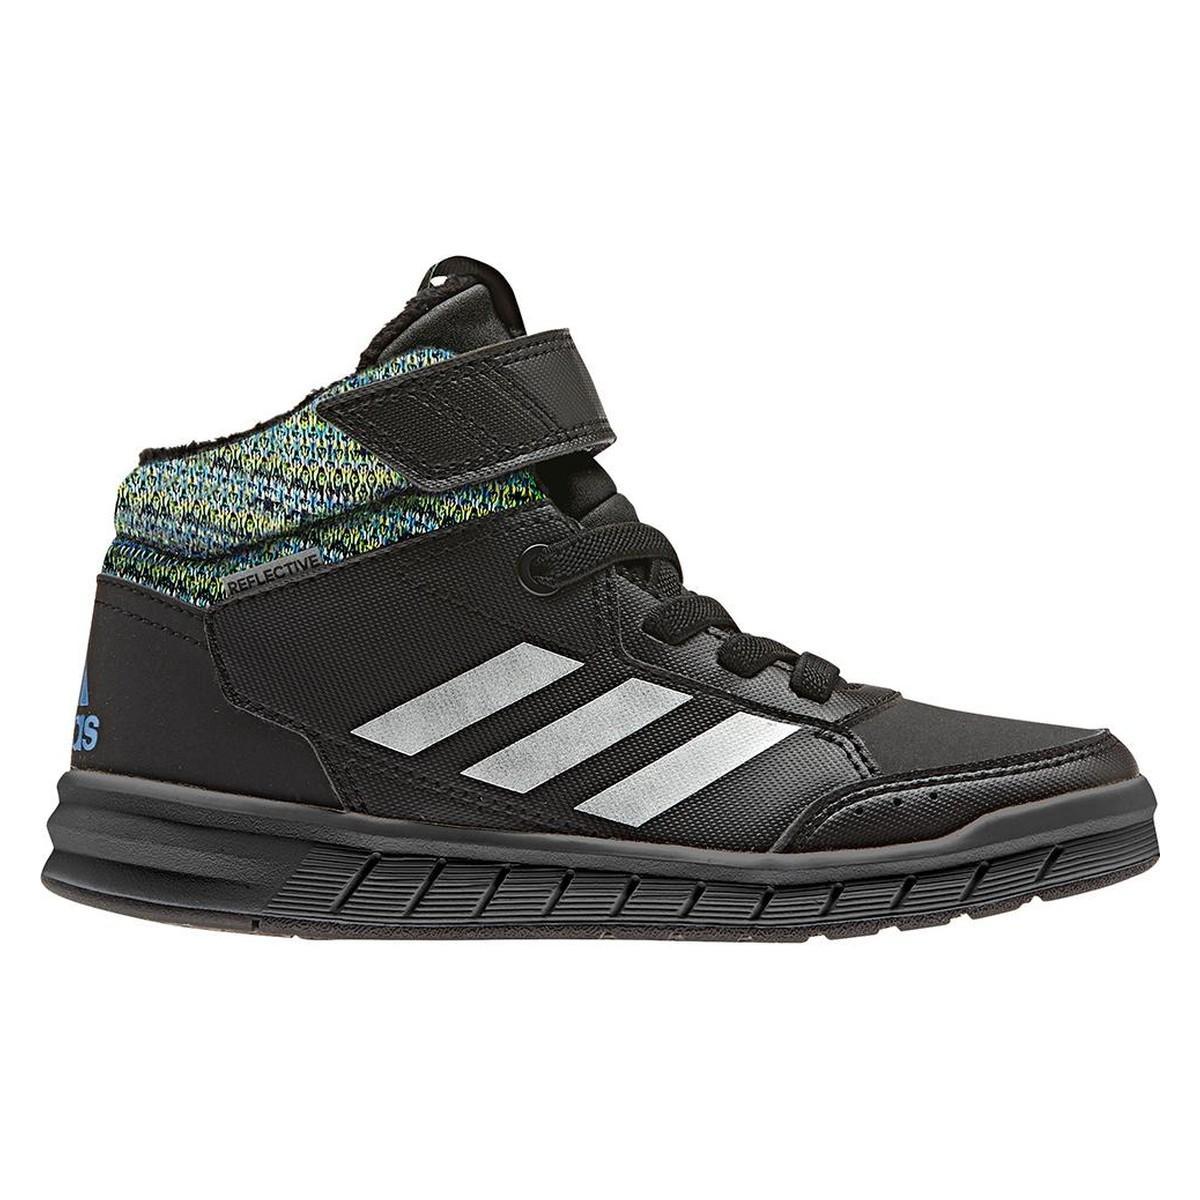 adidas ALTARUN CF K CG6453 the Sneakermeister – Online